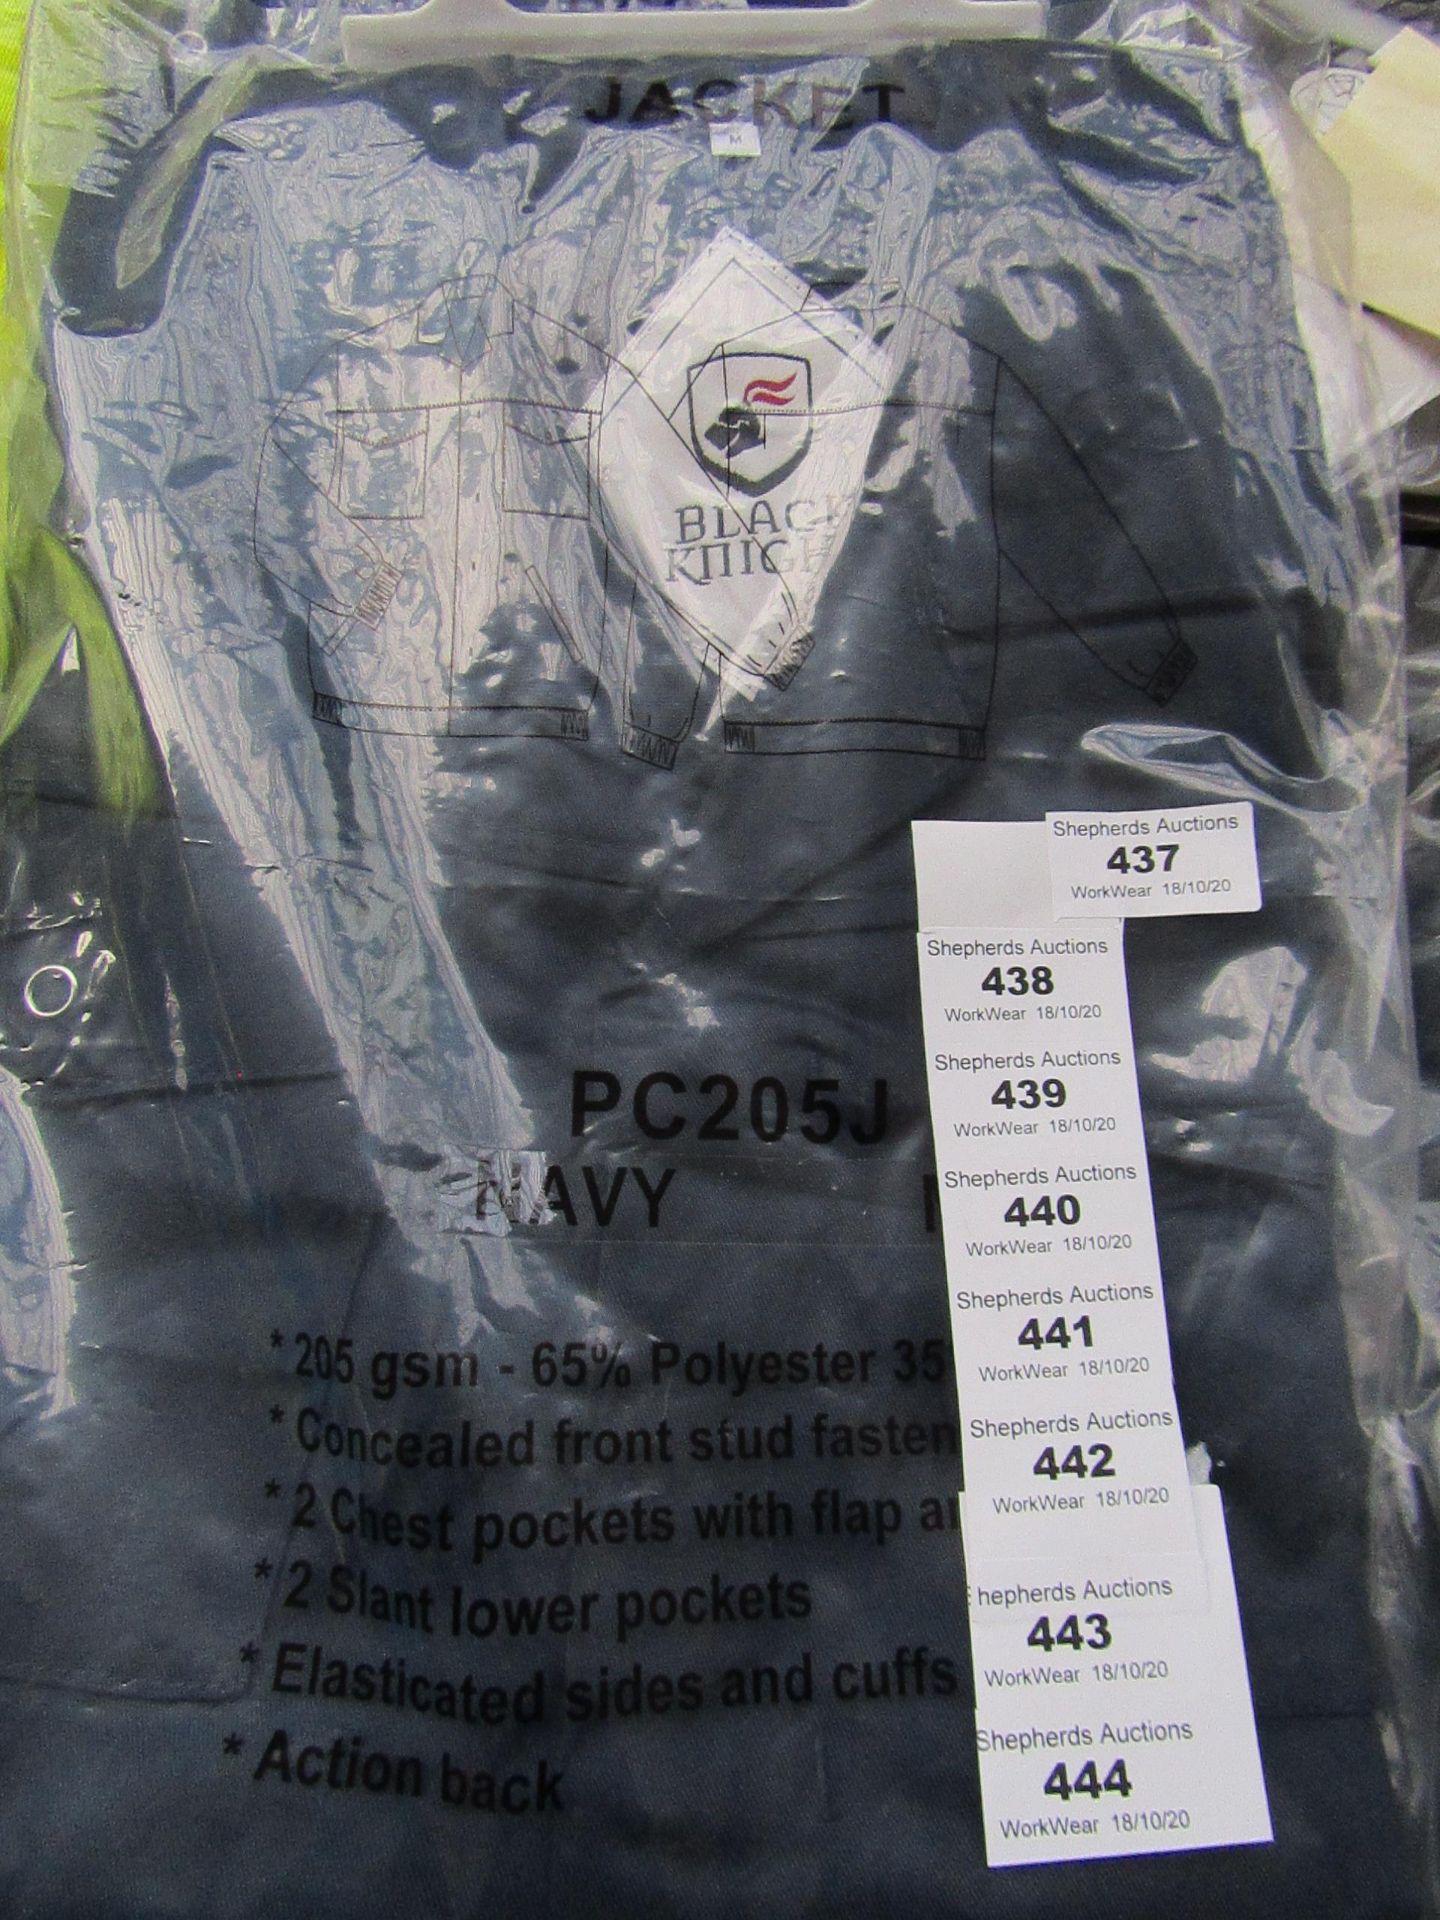 Lot 438 - Black Knight - Navy Jacket - Size Medium - Unused & Packaged.